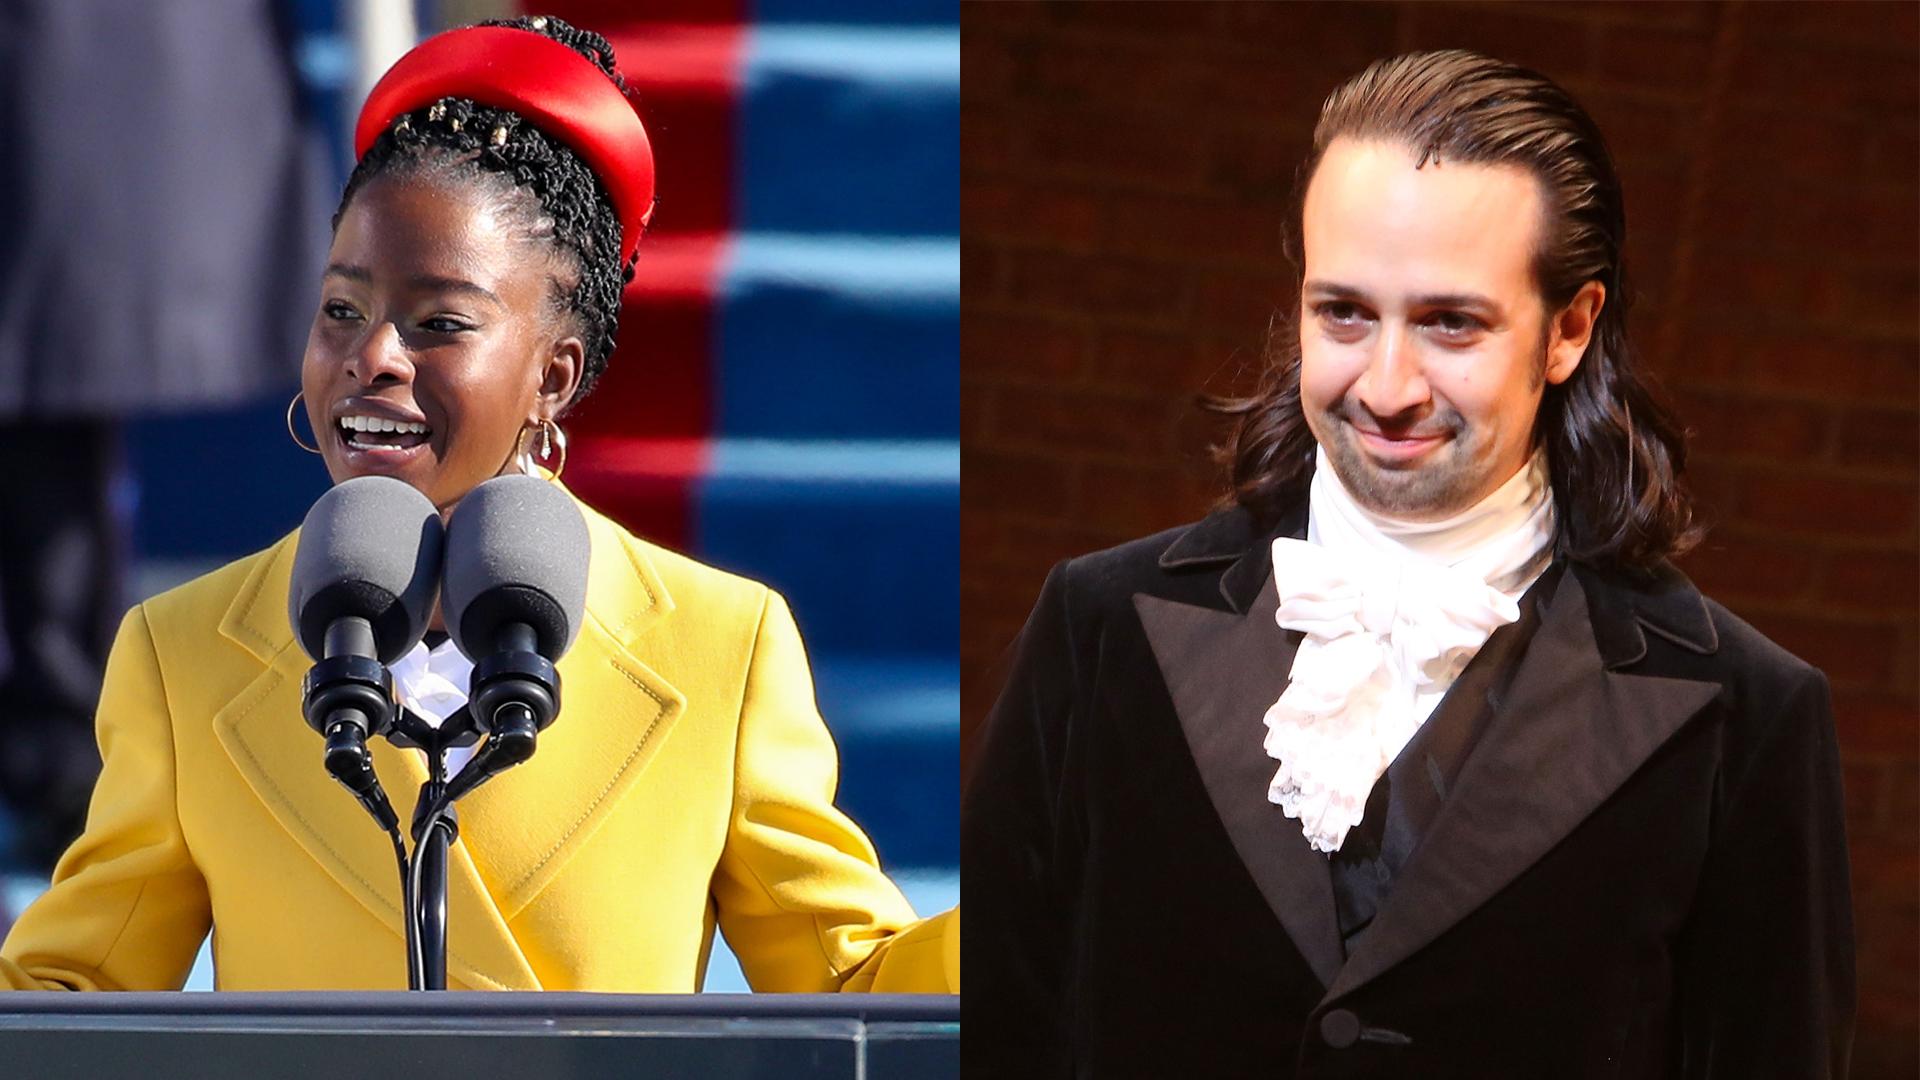 Inaugural poet Amanda Gorman reveals she used a 'Hamilton' song to help beat speech impediment